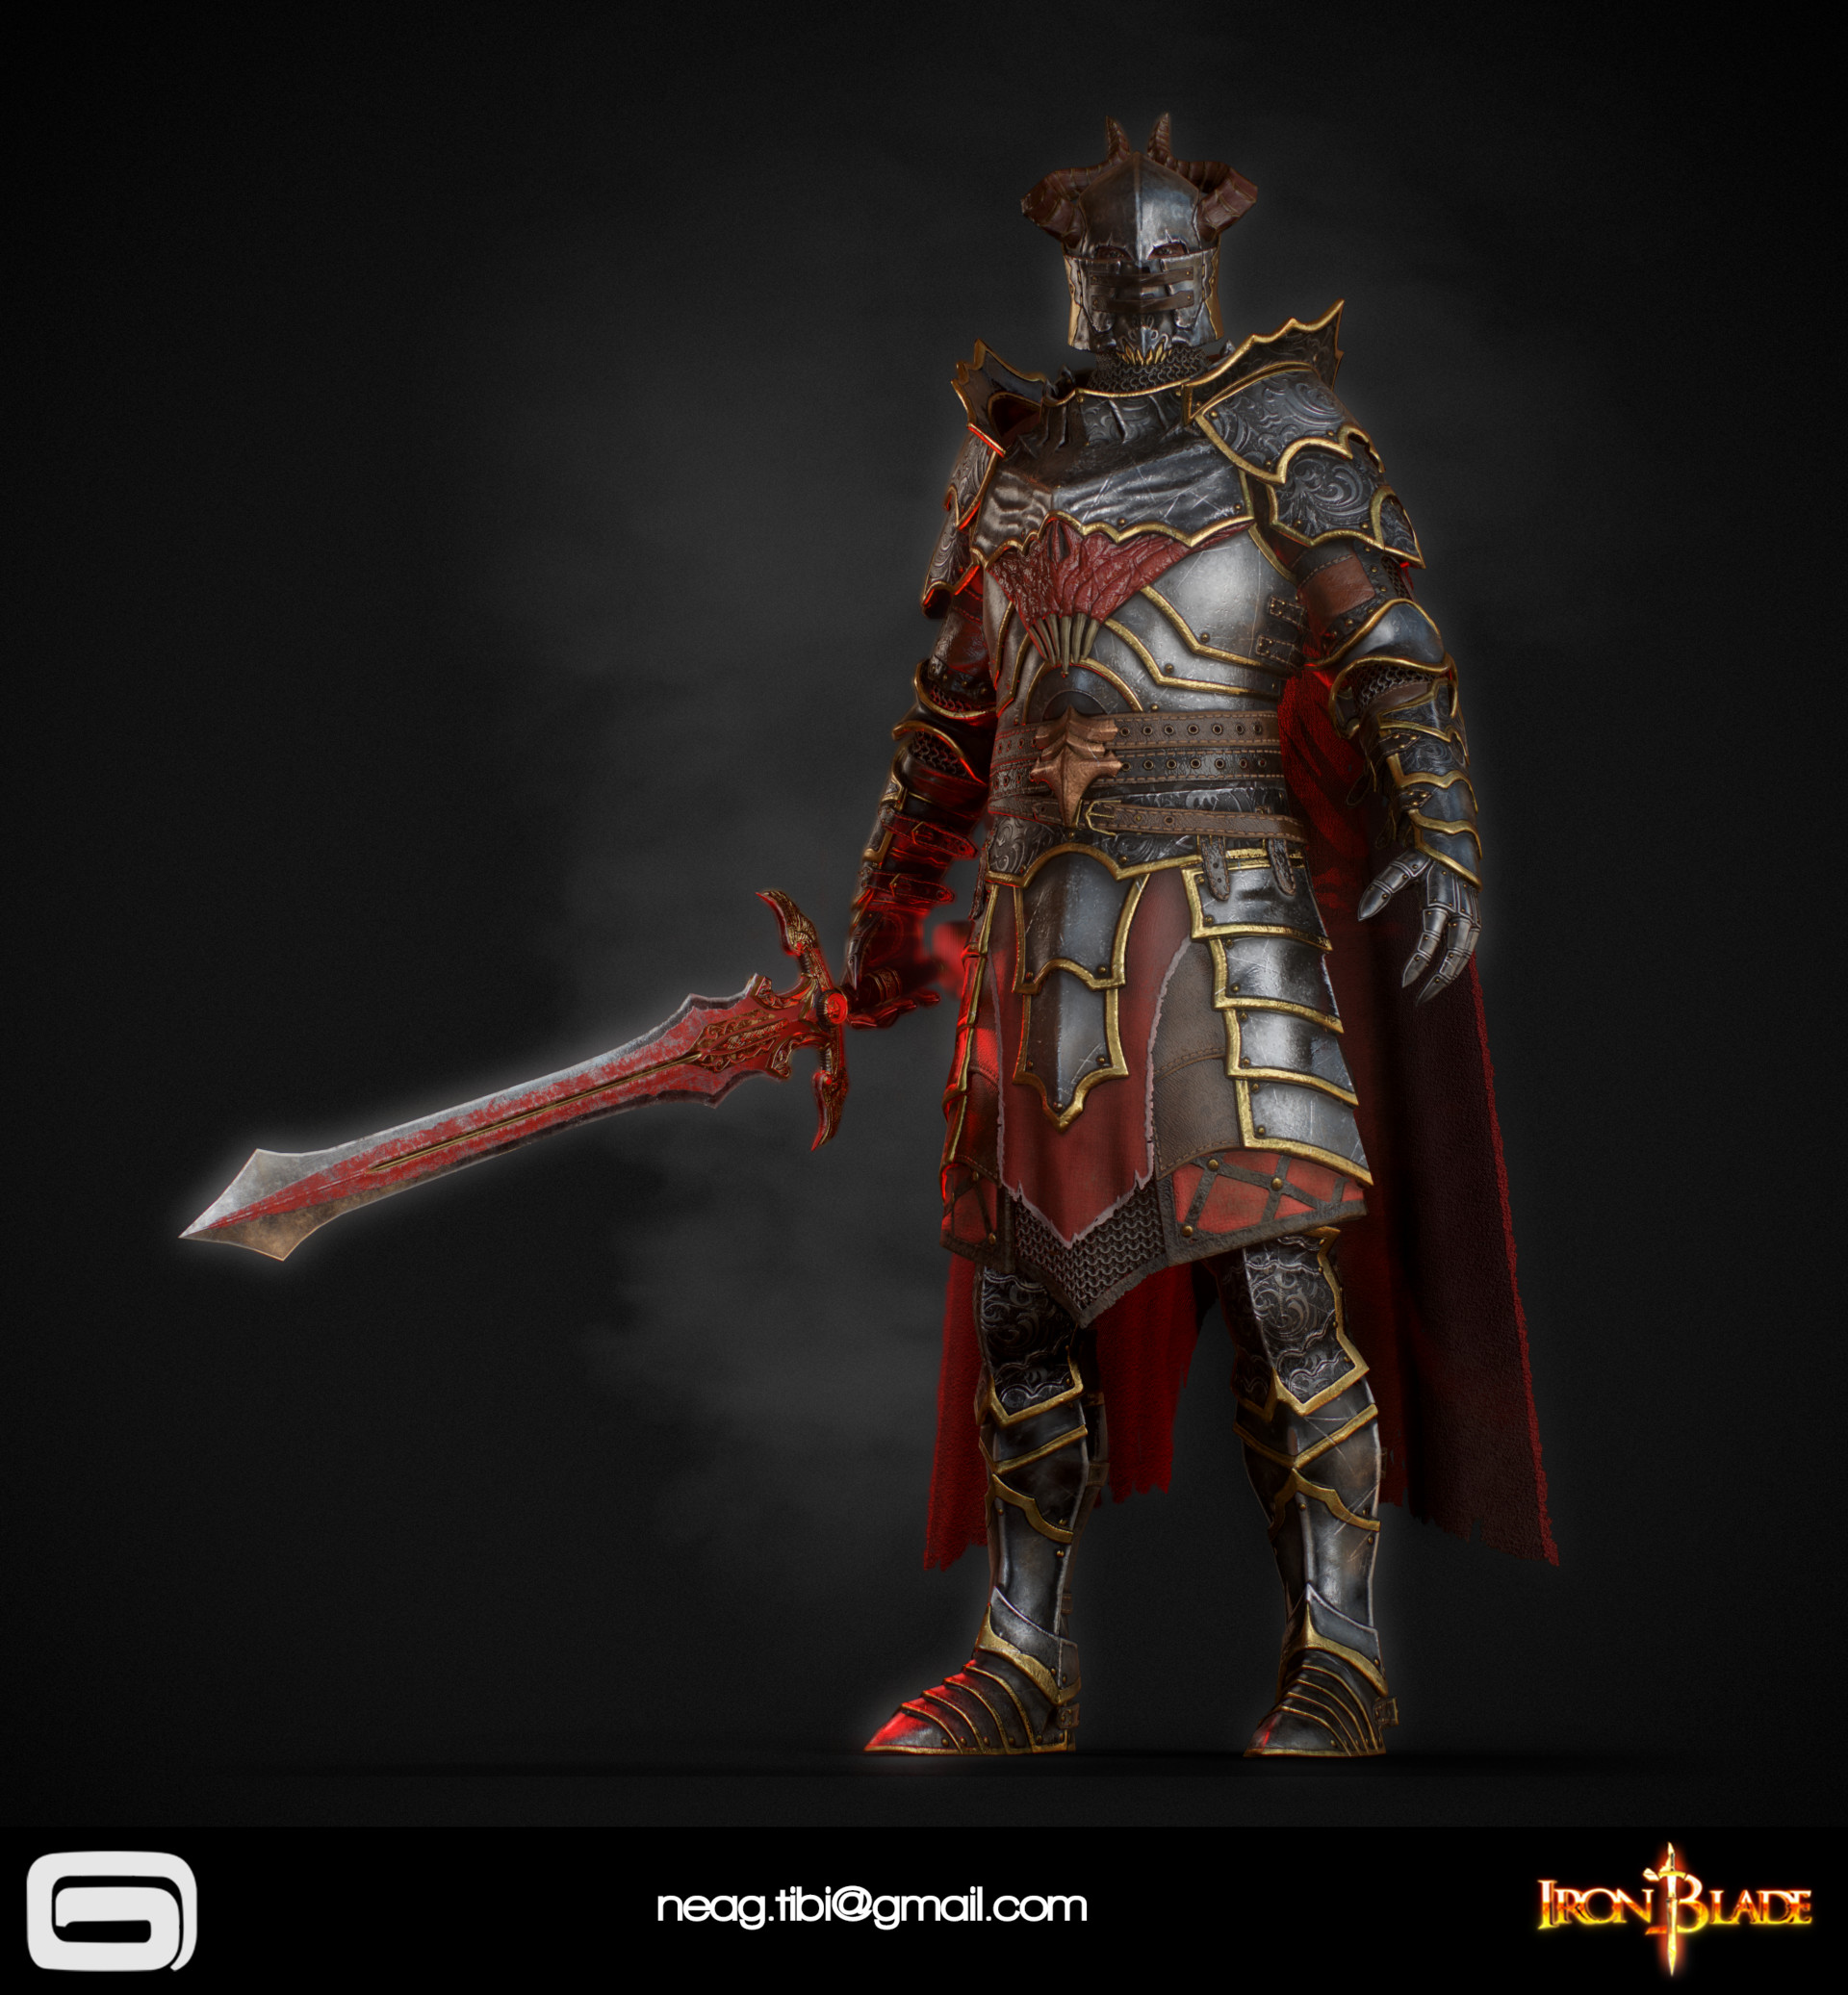 Tibi neag tibi neag iron blade mc armor 10c low poly 13